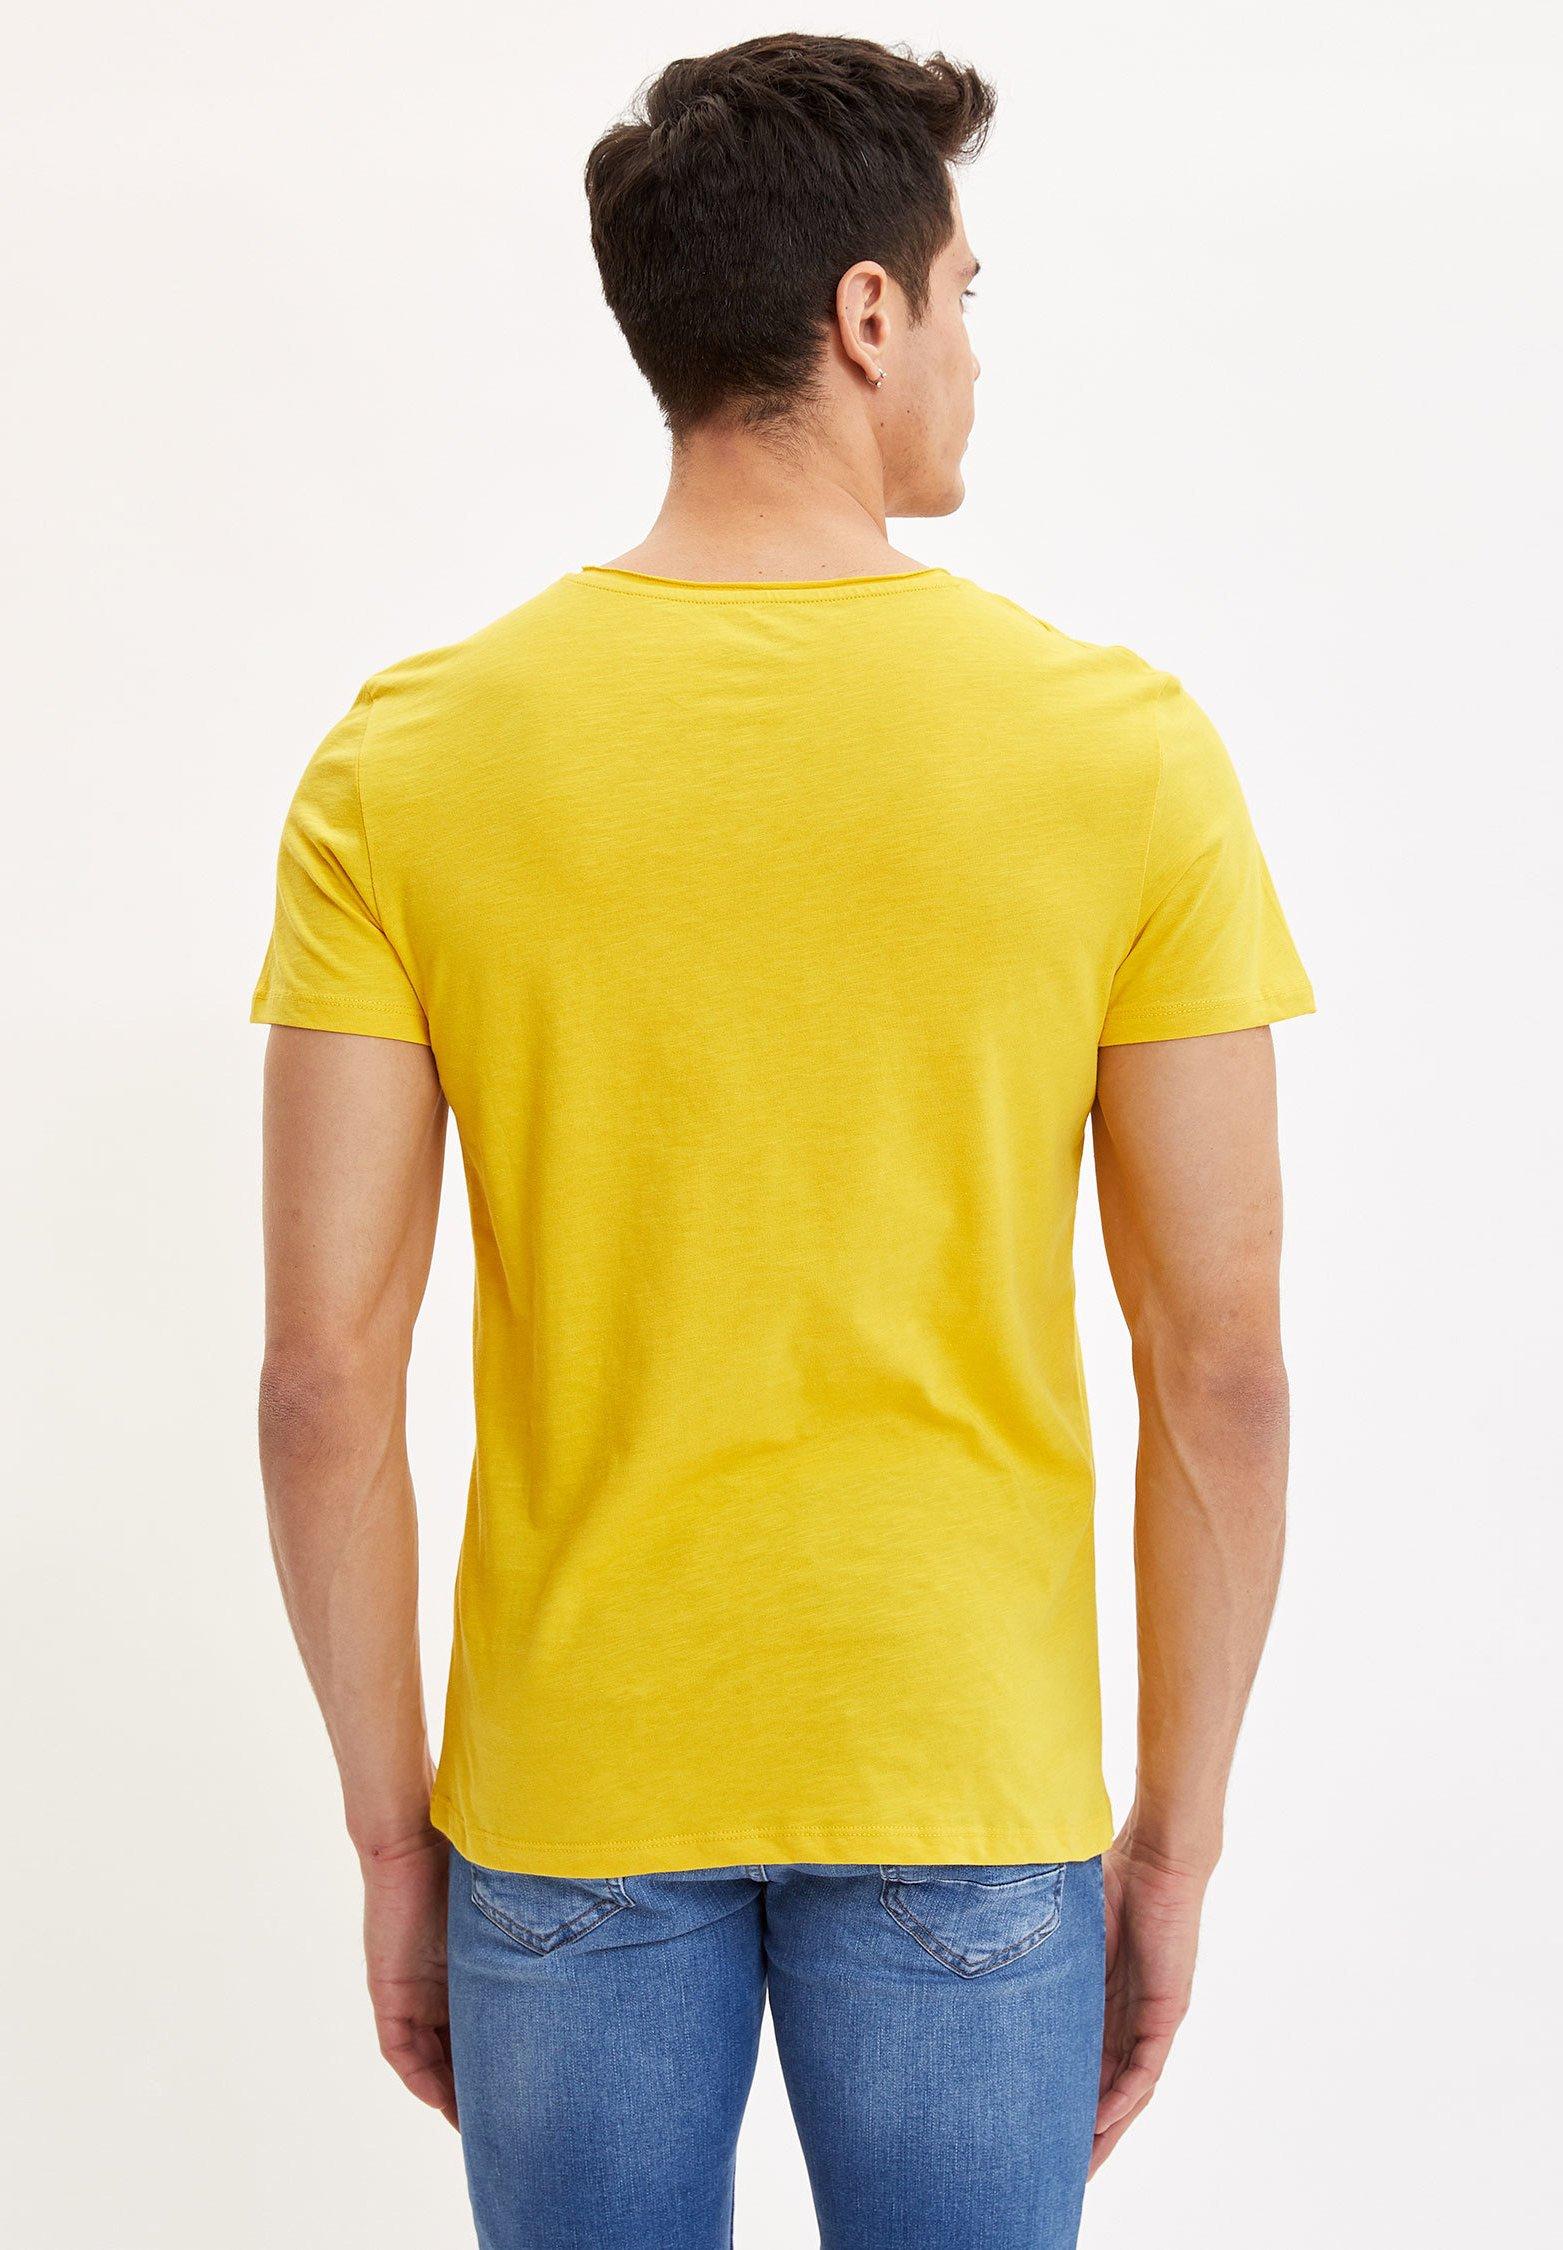 DeFacto Basic T-shirt - yellow UlsXn